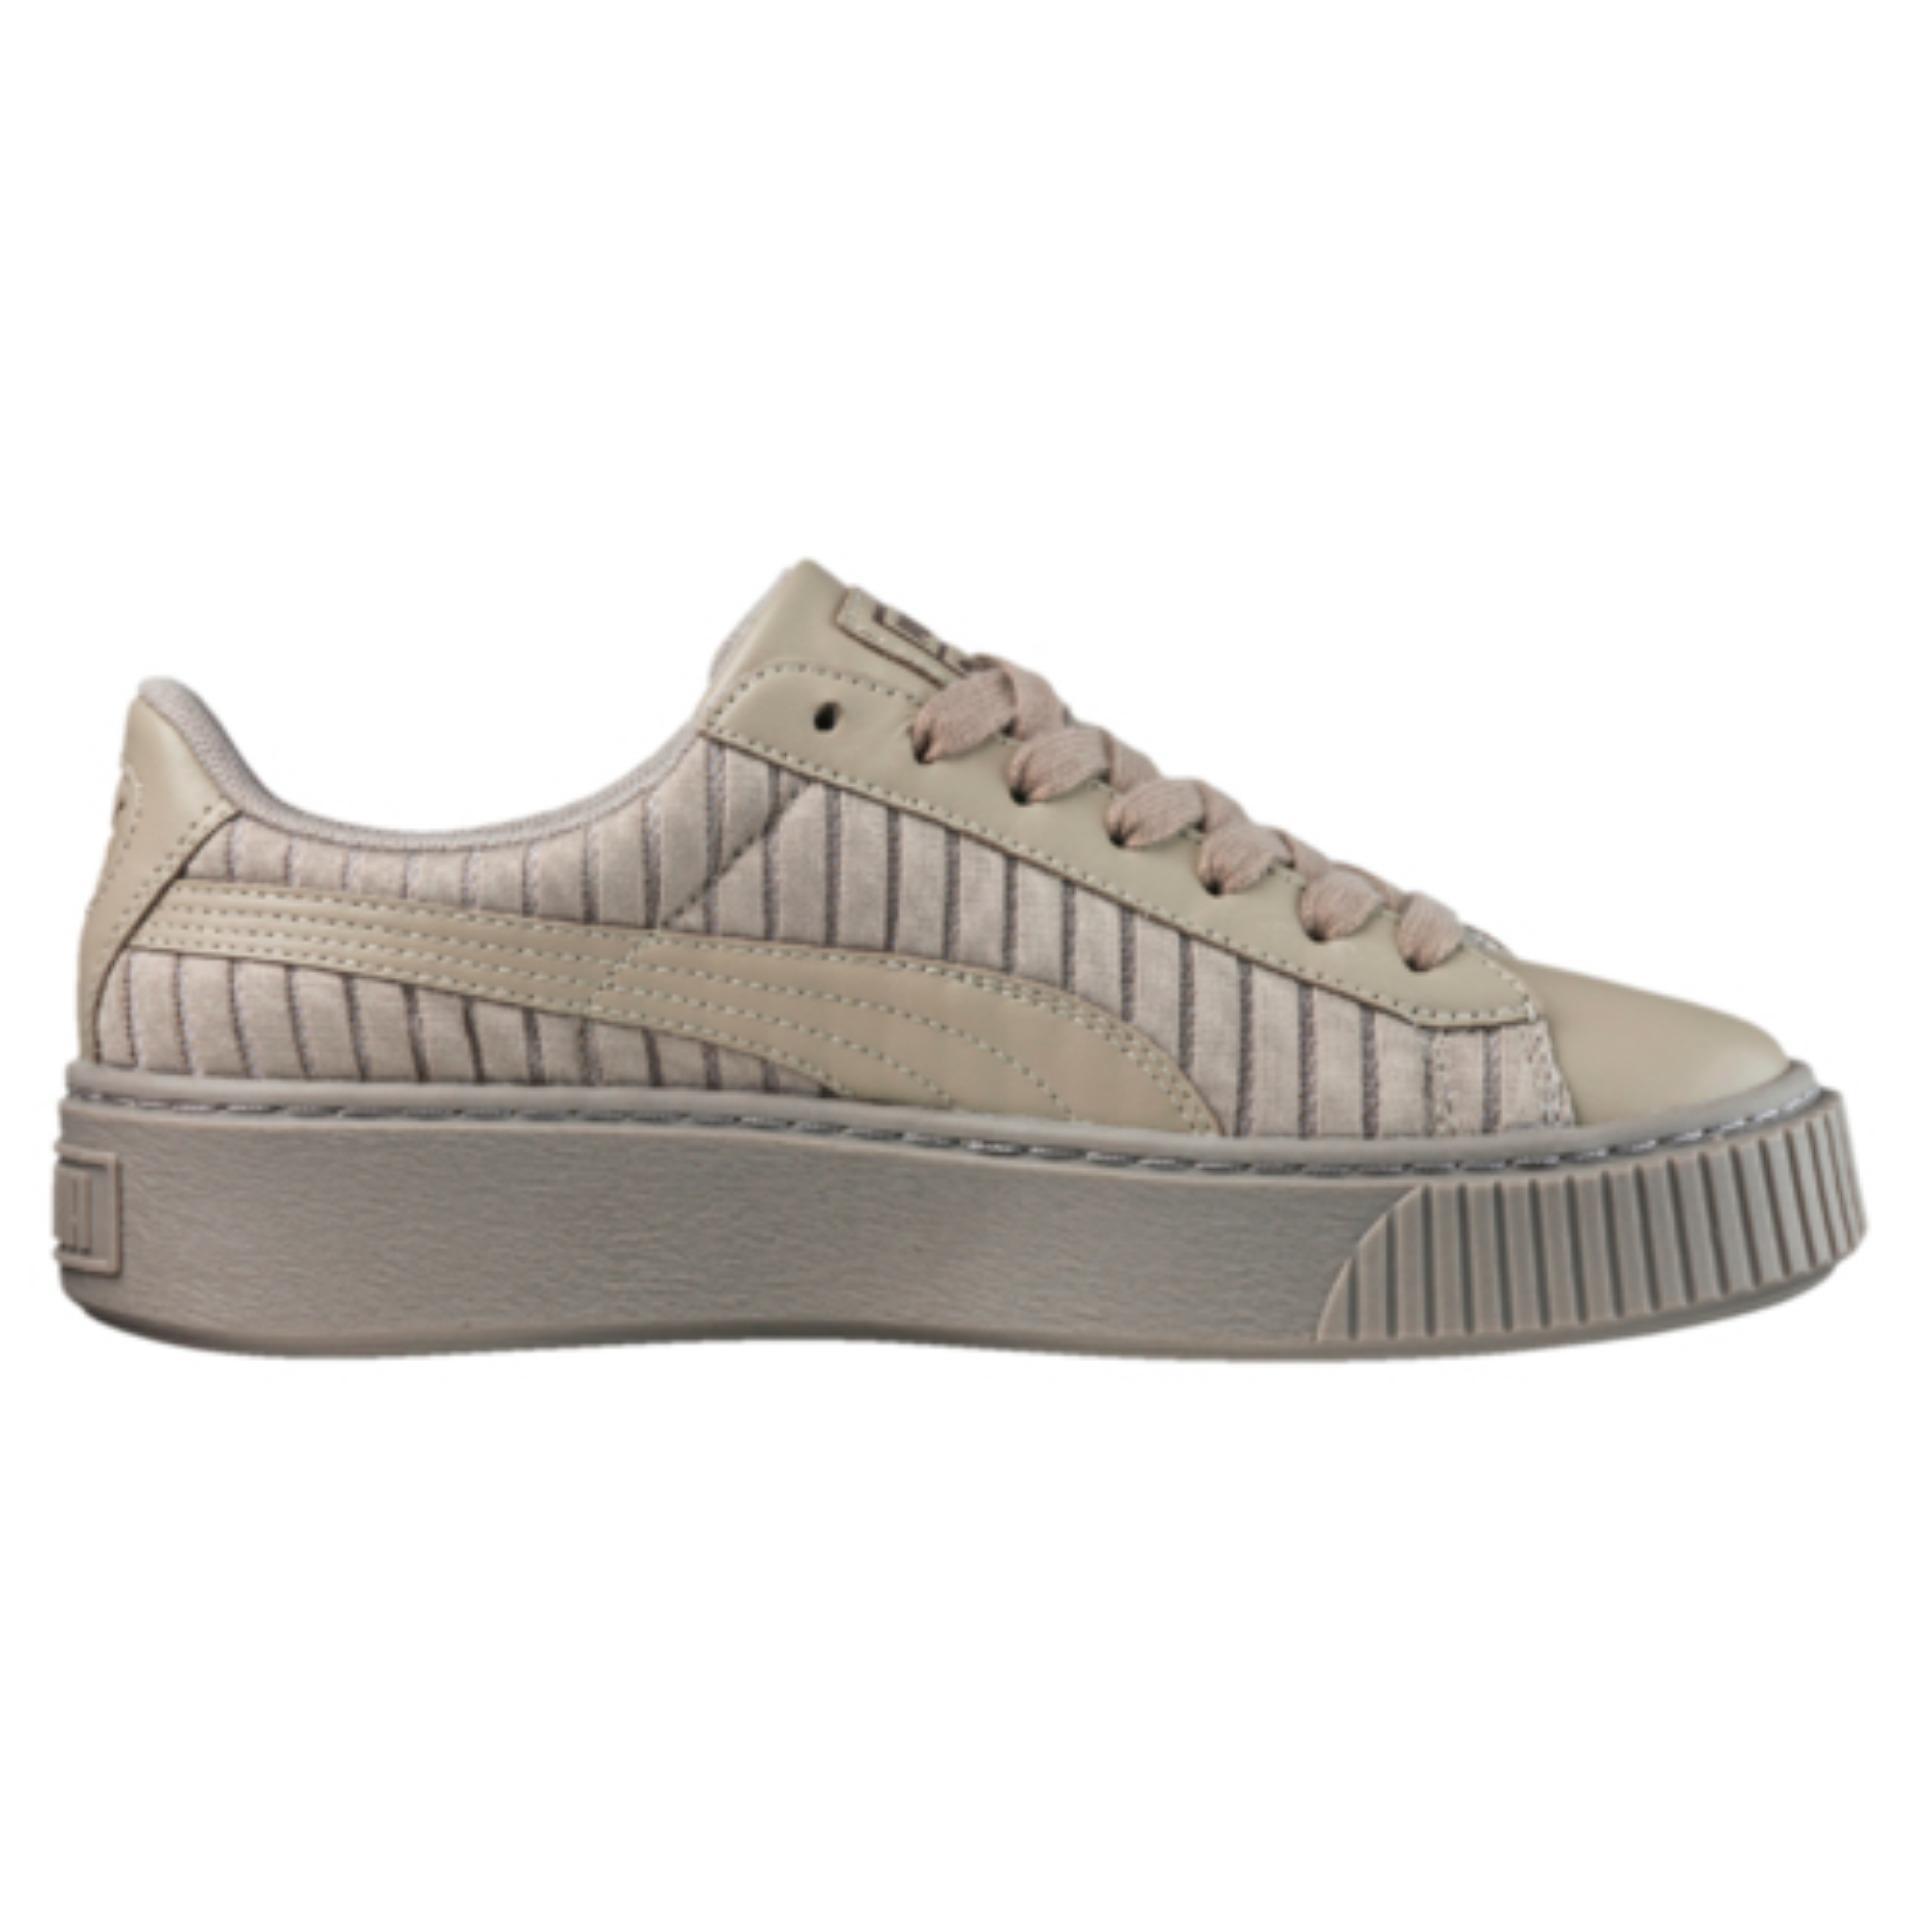 the best attitude fe6a8 7c3ea Puma Basket Platform EP Women Sneakers - Rock Ridge - Price ...